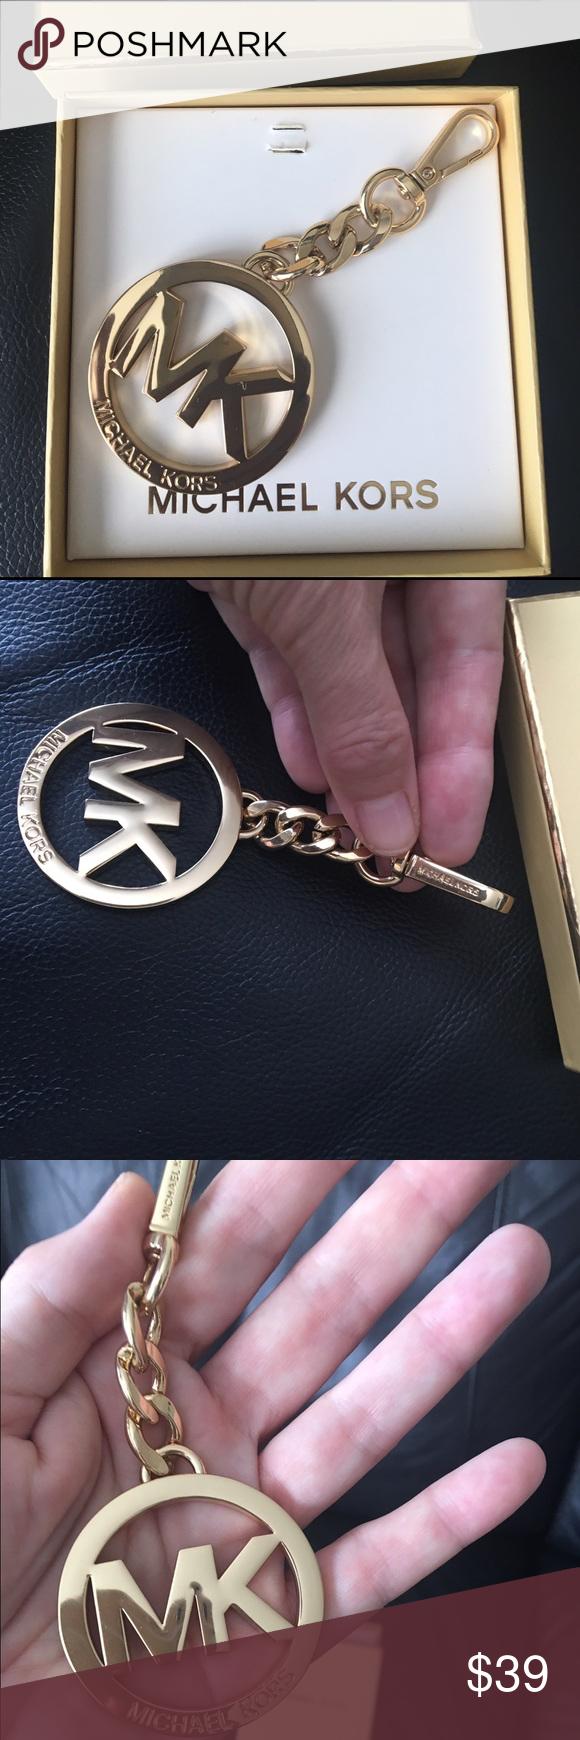 New Michael Kors Large Logo Key Chain/ Bag Charm New Authentic Michael Kors Large Golden Logo KeyChain/ Bag Charm. Come with box Michael Kors Accessories Key & Card Holders